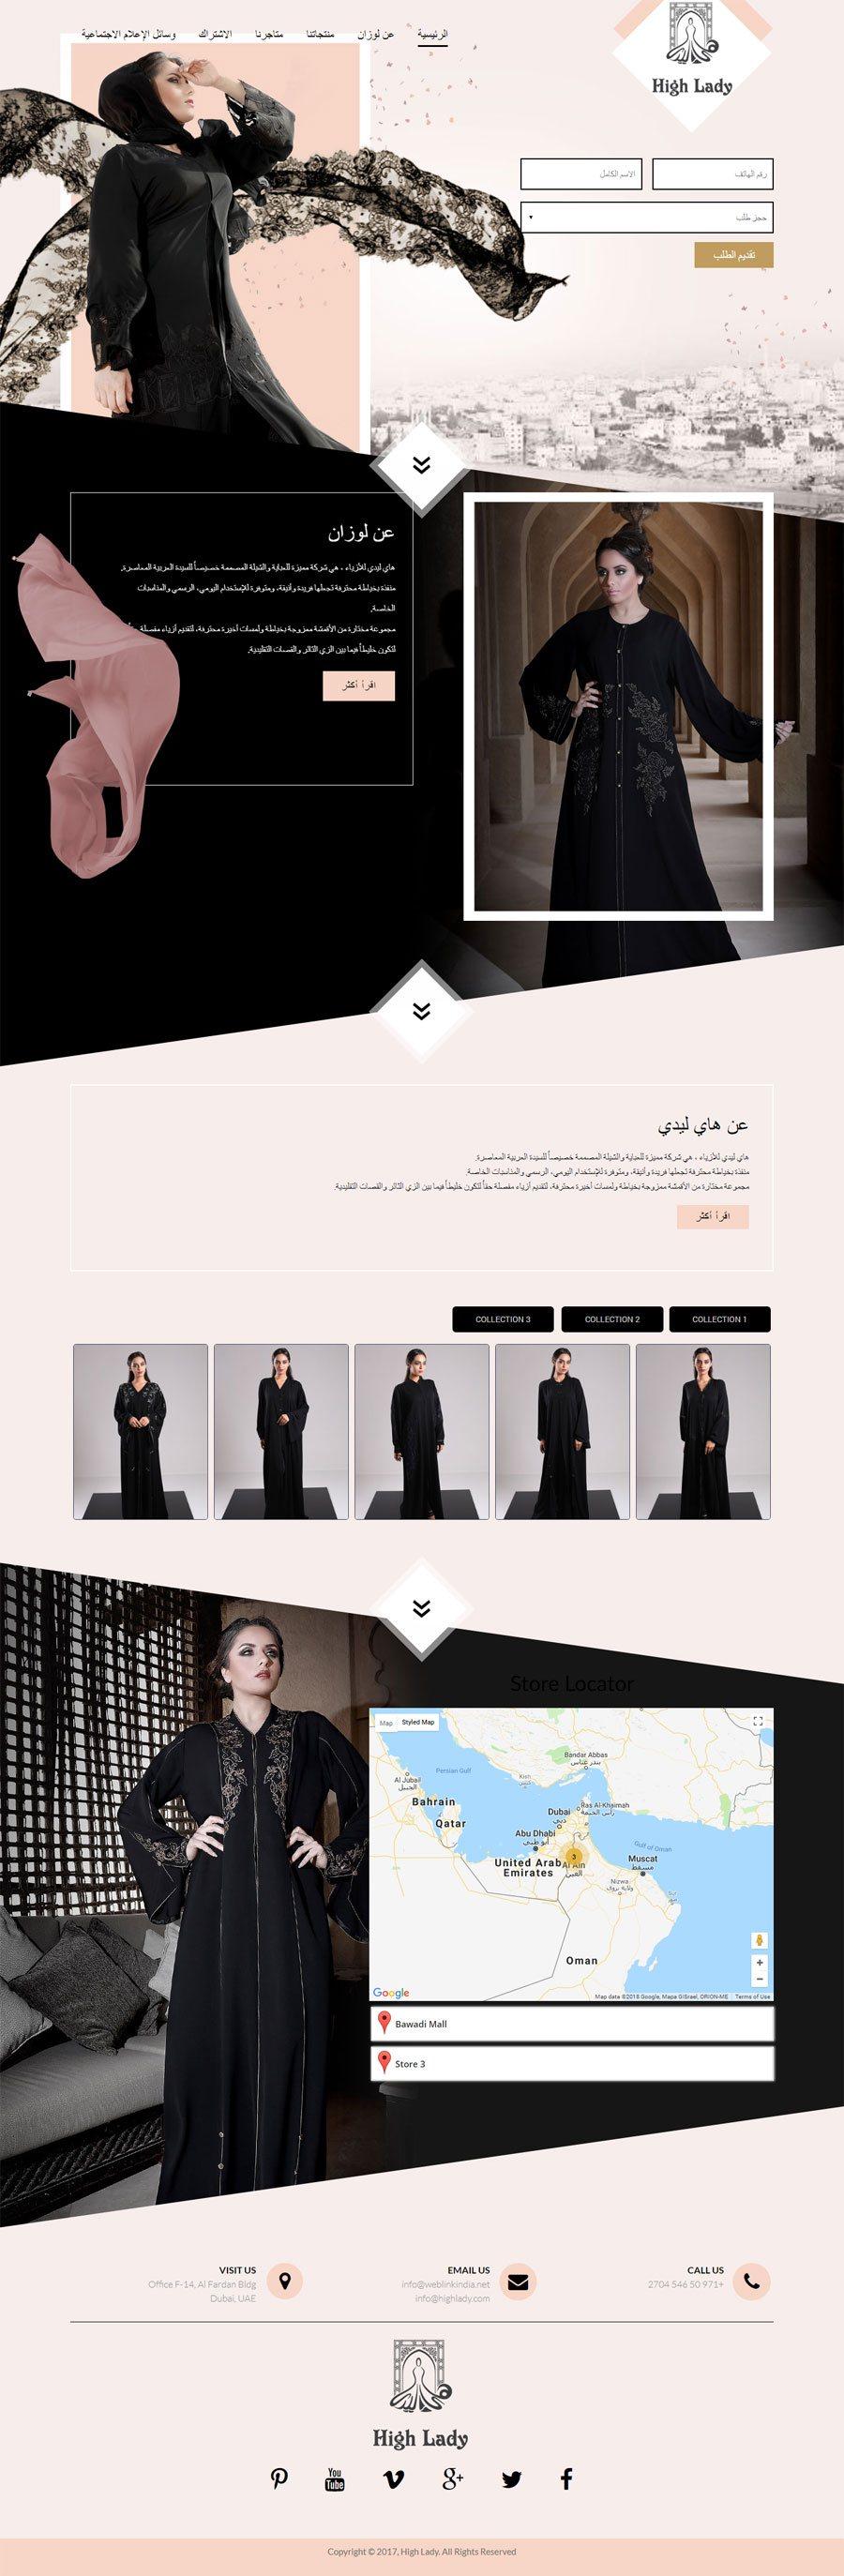 High Lady Saudi Arabia Web Design